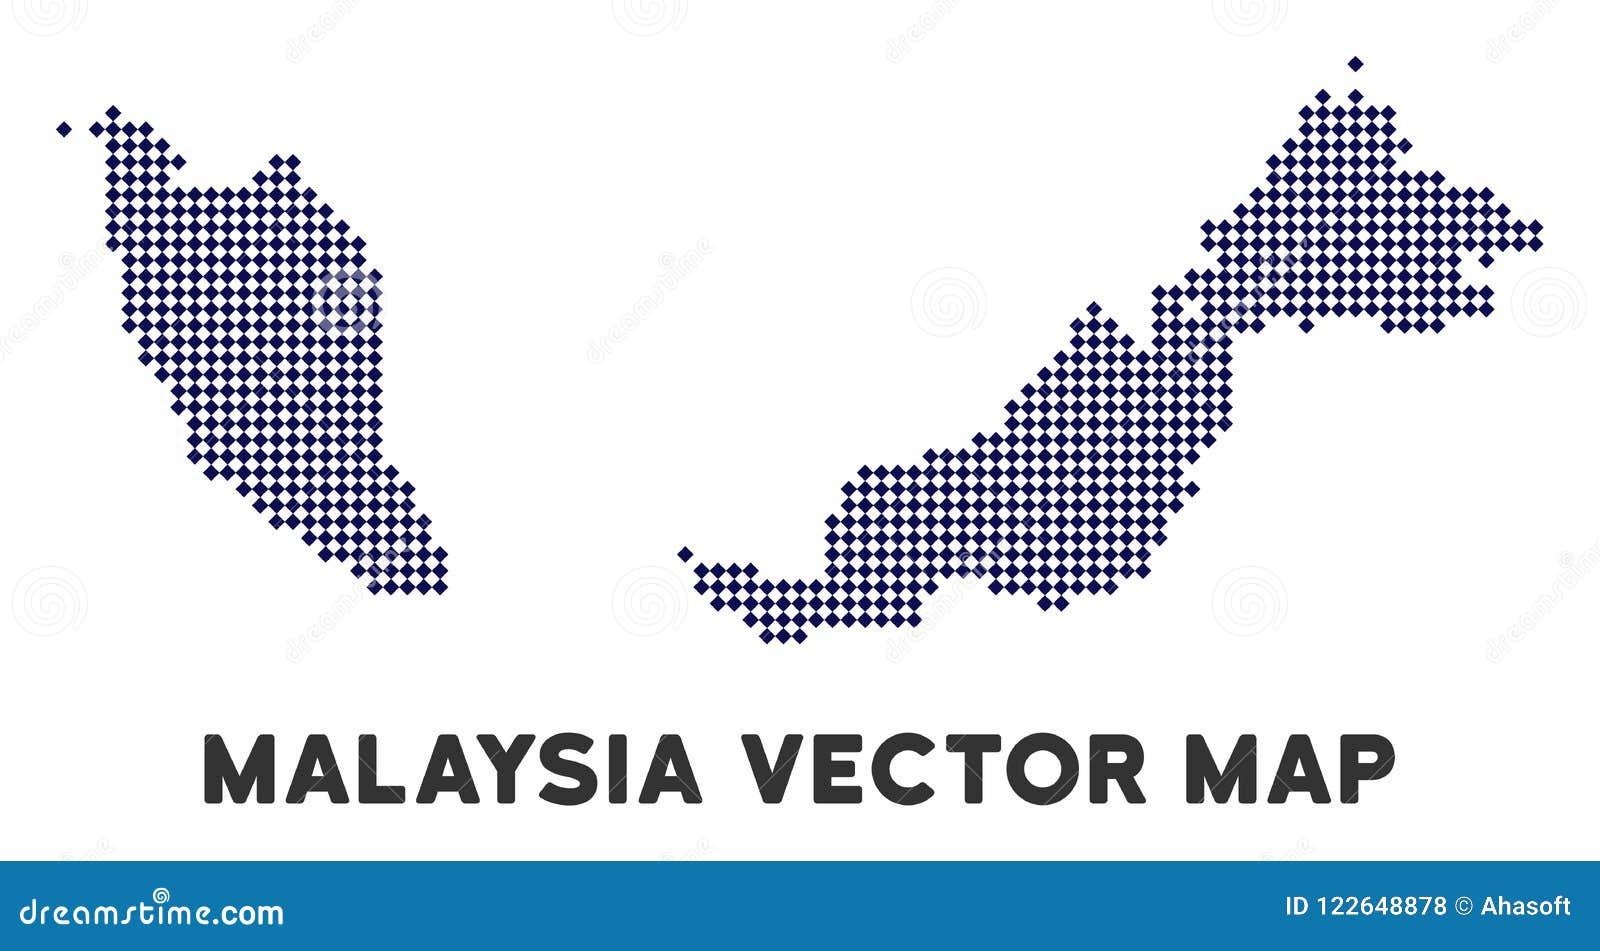 Dot Malaysia Map stock vector. Illustration of concept ... on sarawak map, iran map, pacific islands map, china map, cyprus map, europe map, phillipines map, armenia map, yemen map, kota kinabalu map, world map, australia map, singapore on map, thailand map, united kingdom map, french polynesia map, holland map, japan map, chile map, selangor map, ireland map, georgia map, ukraine map,